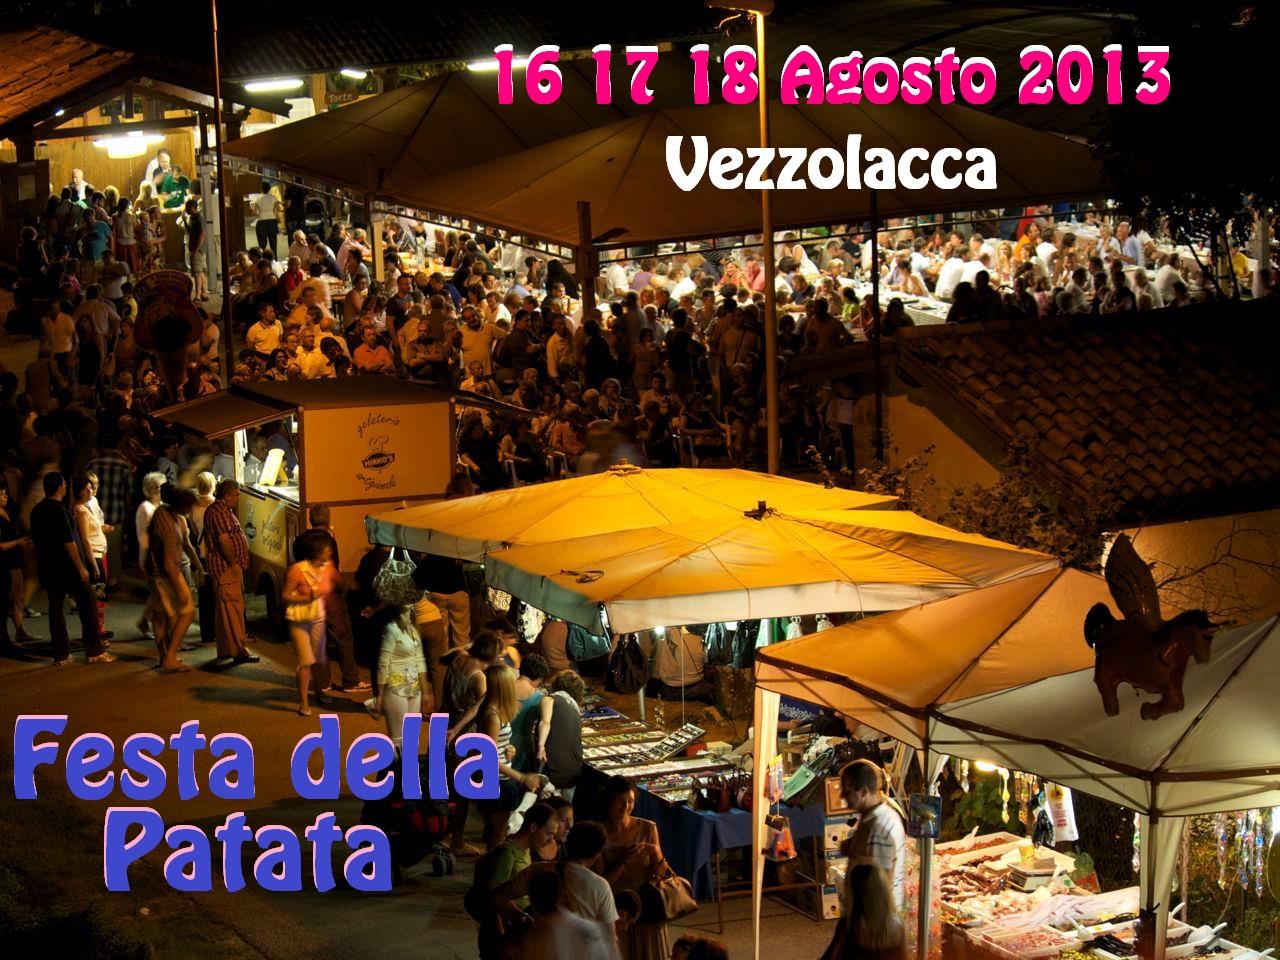 festa Patata 2013